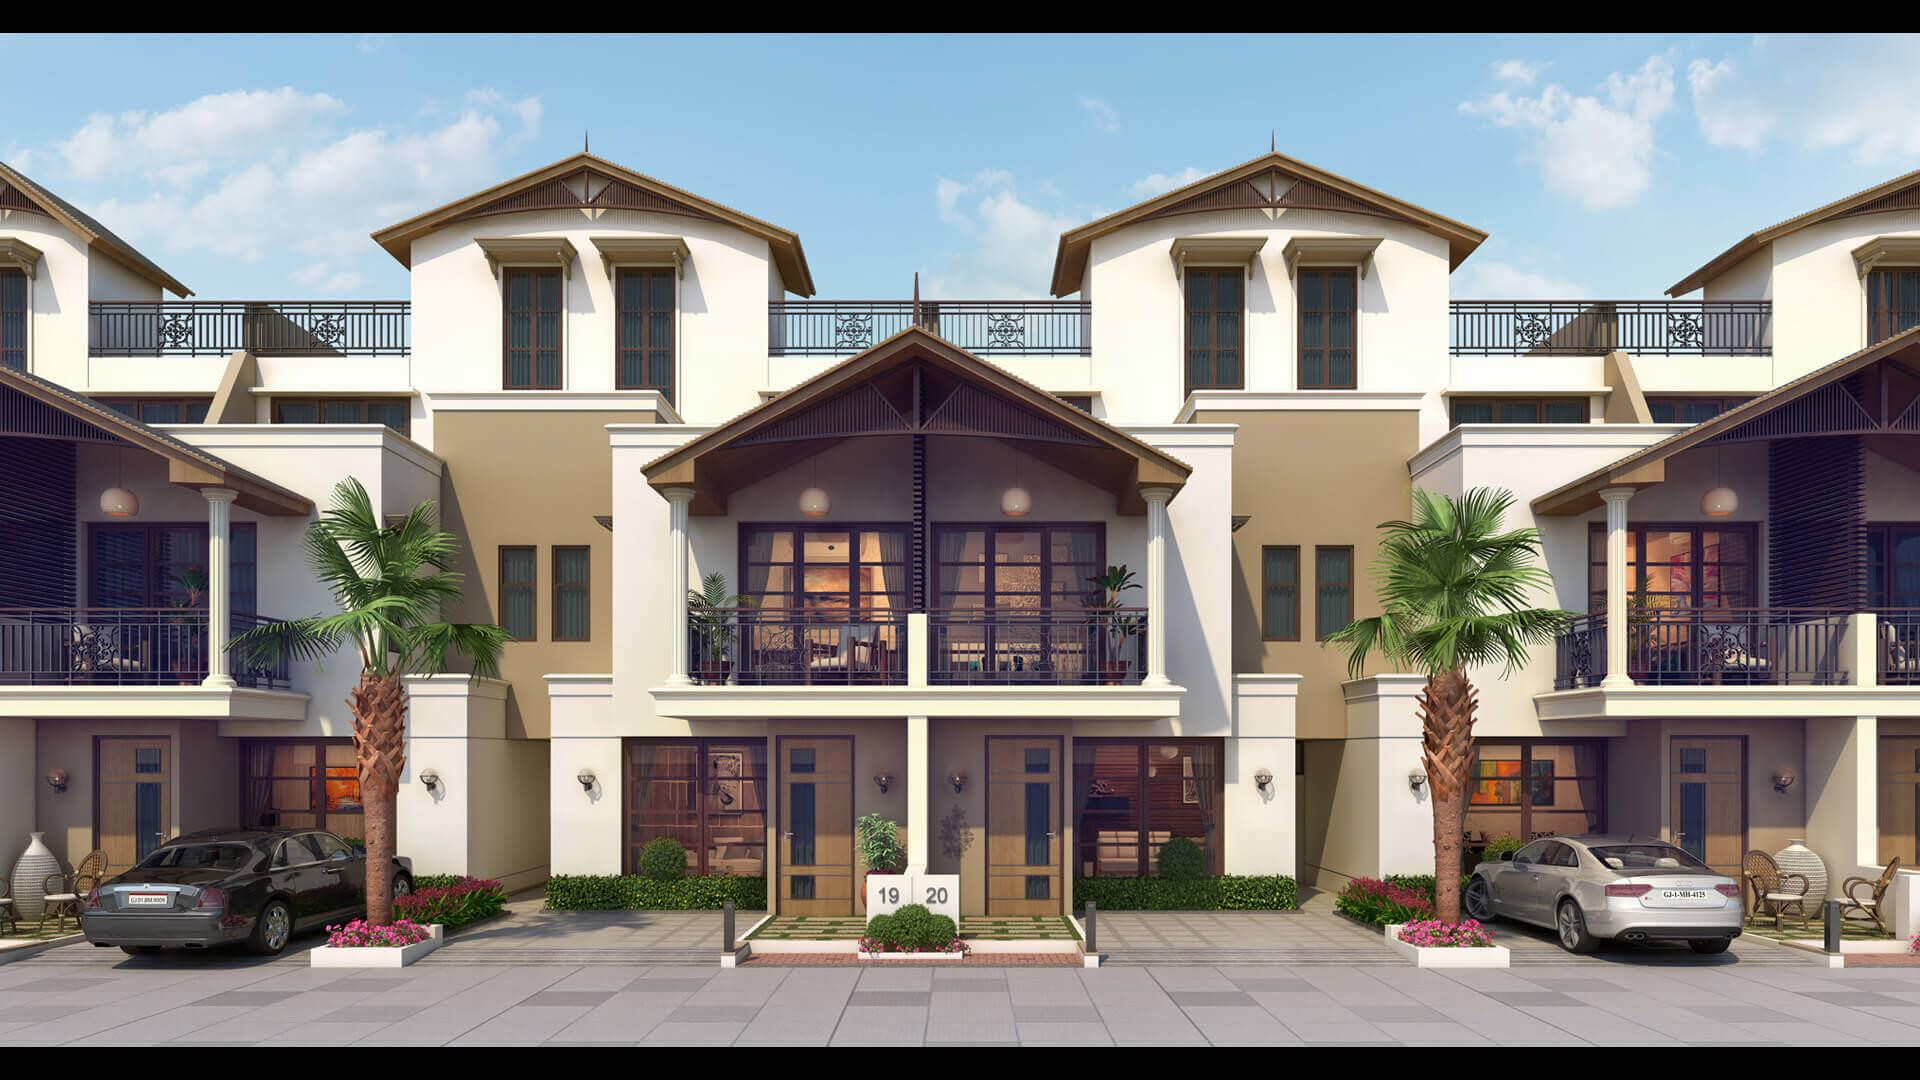 Residential Exterior Design Re....